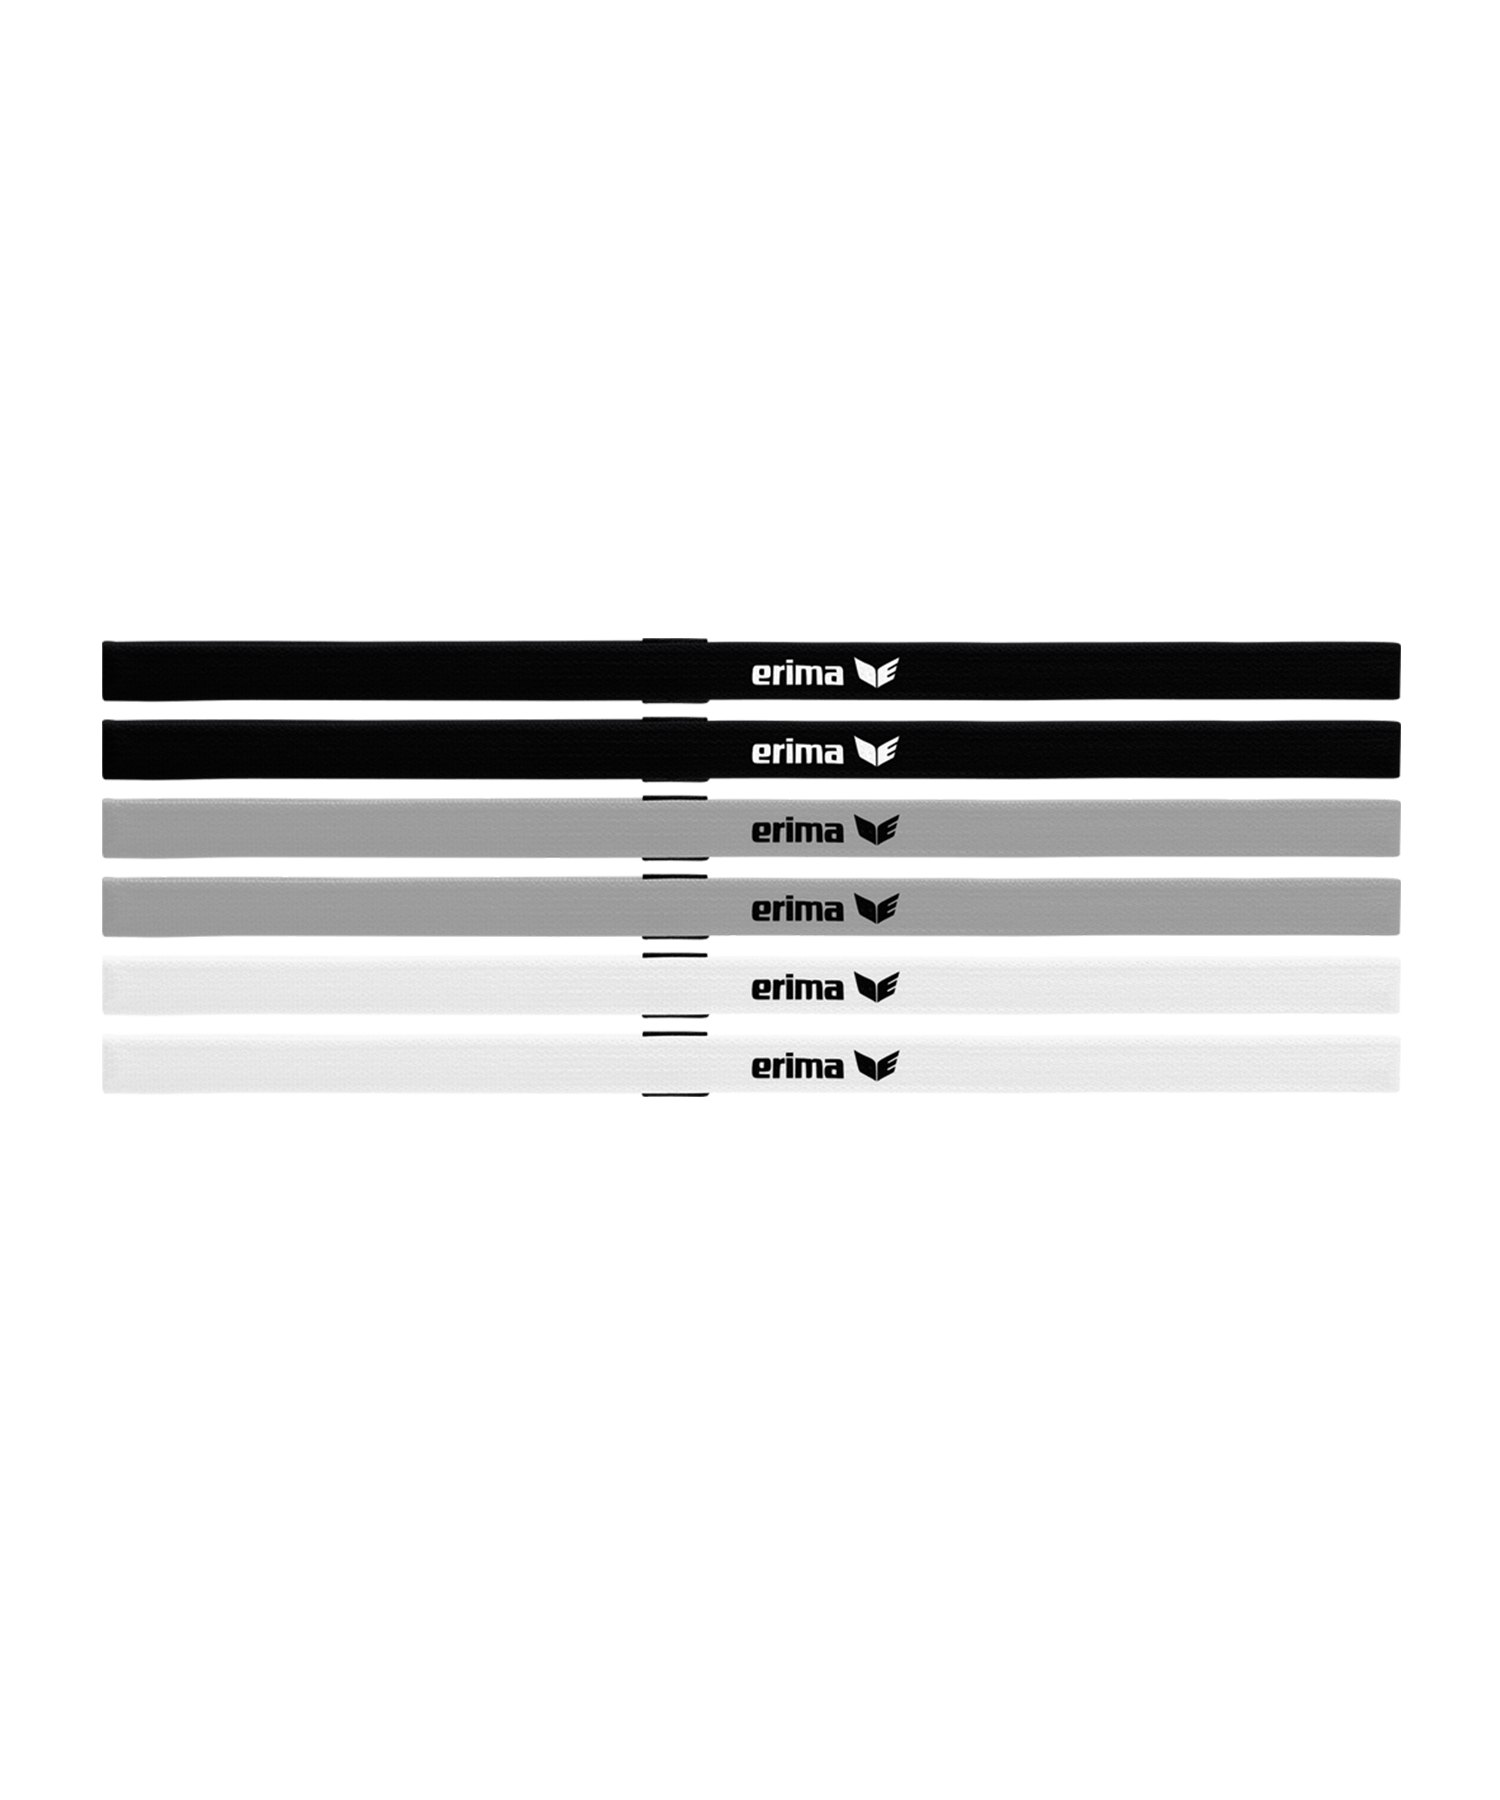 Erima Haarband Black Series 6er Set Schwarz Grau - schwarz